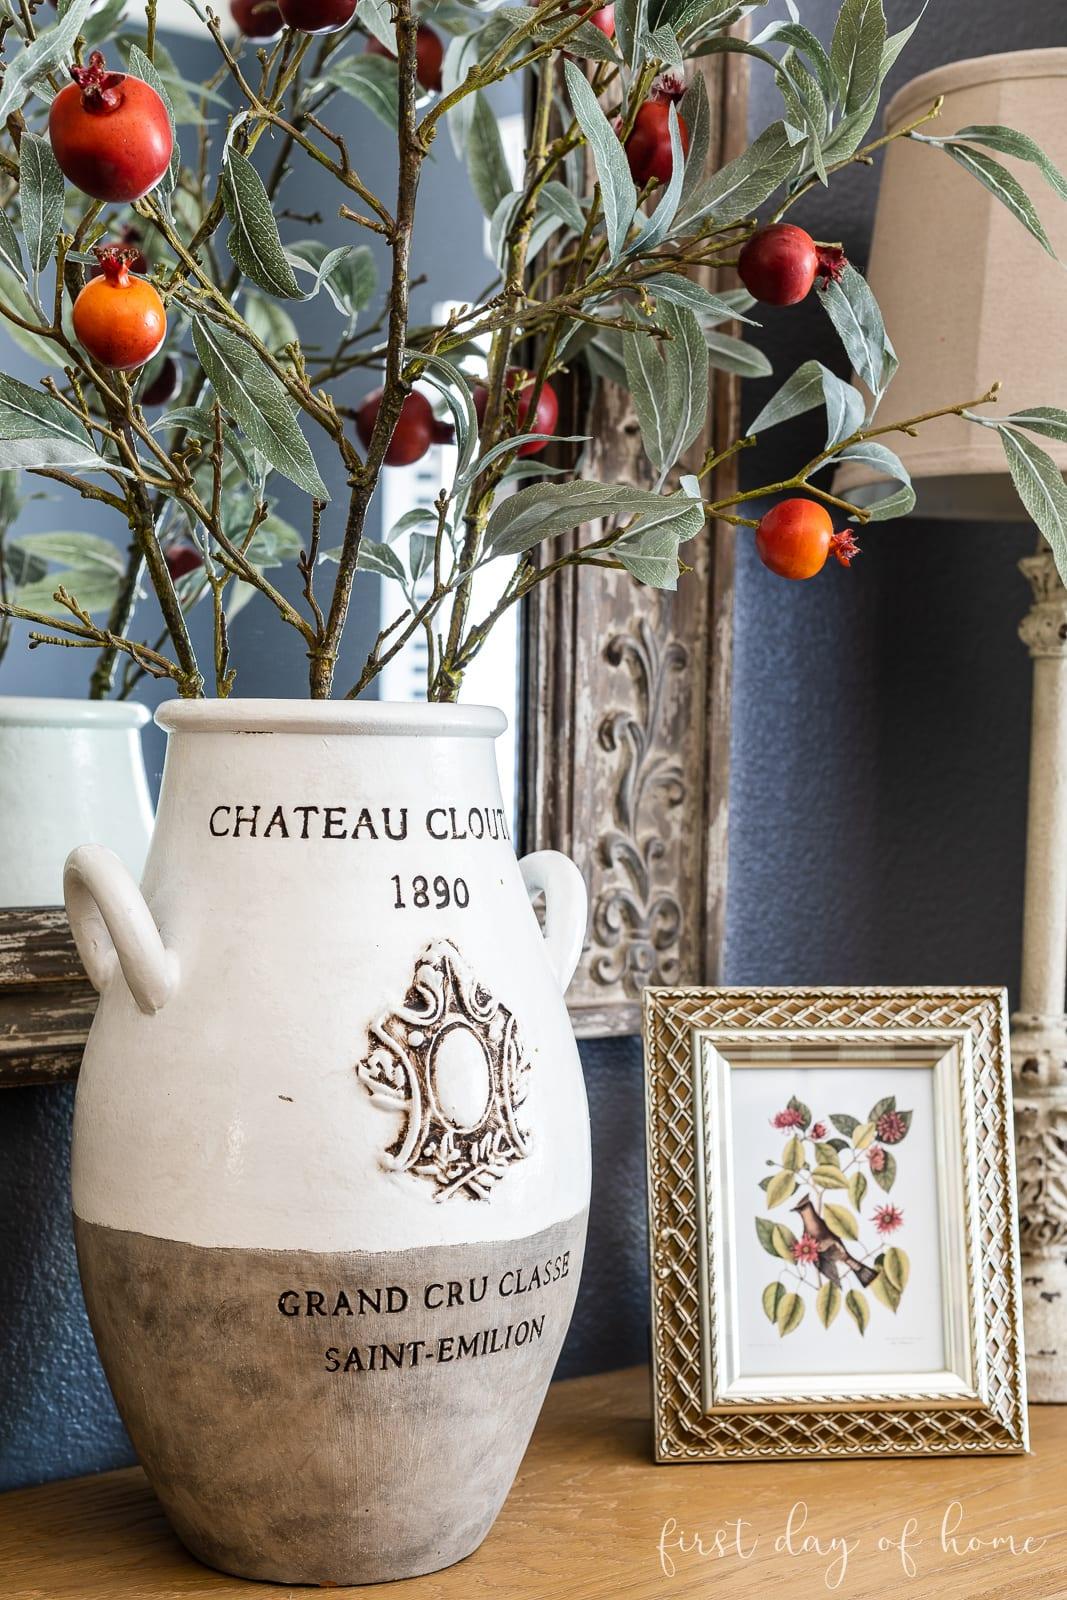 Large urn vase with fall foliage next to fall vintage botanical prints